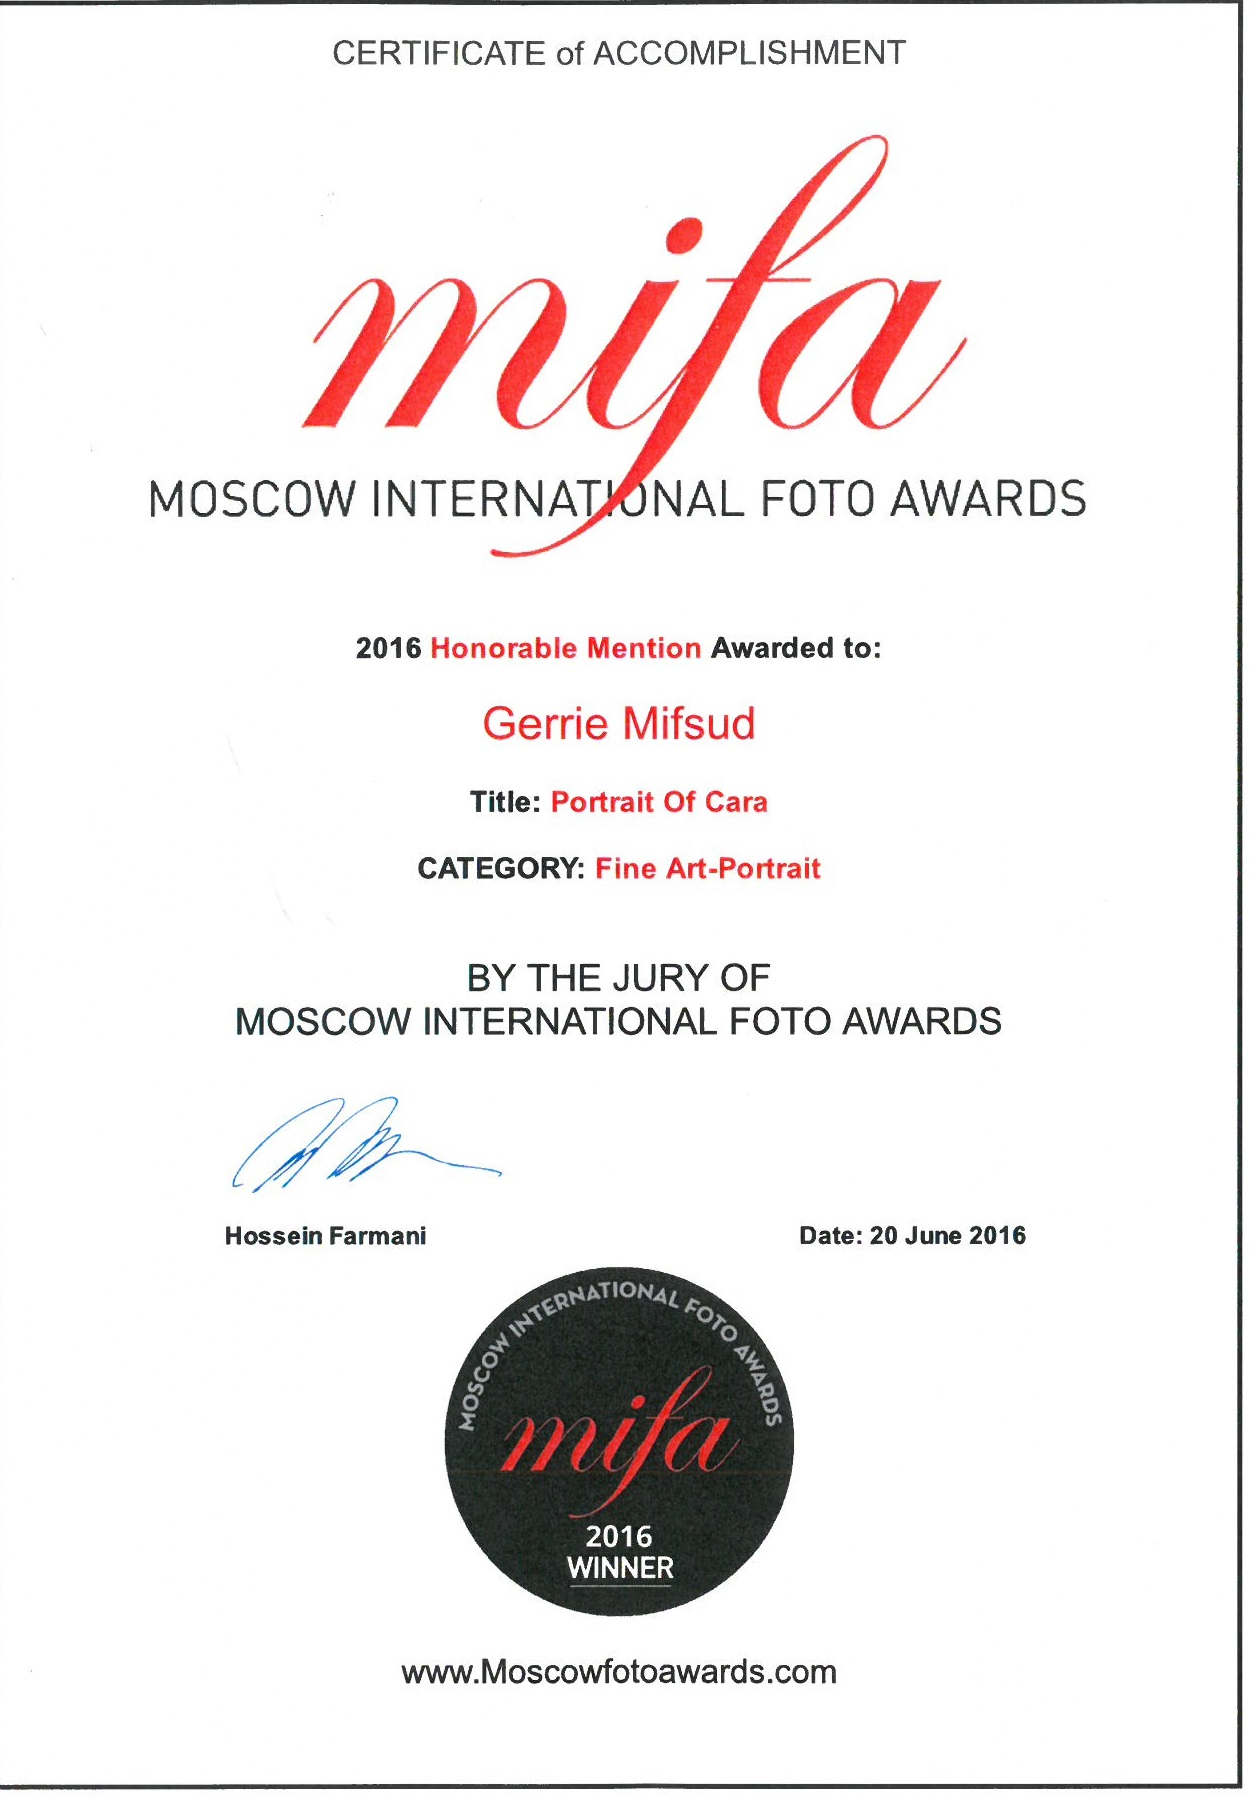 Moscow International Foto Awards 2016.jpg